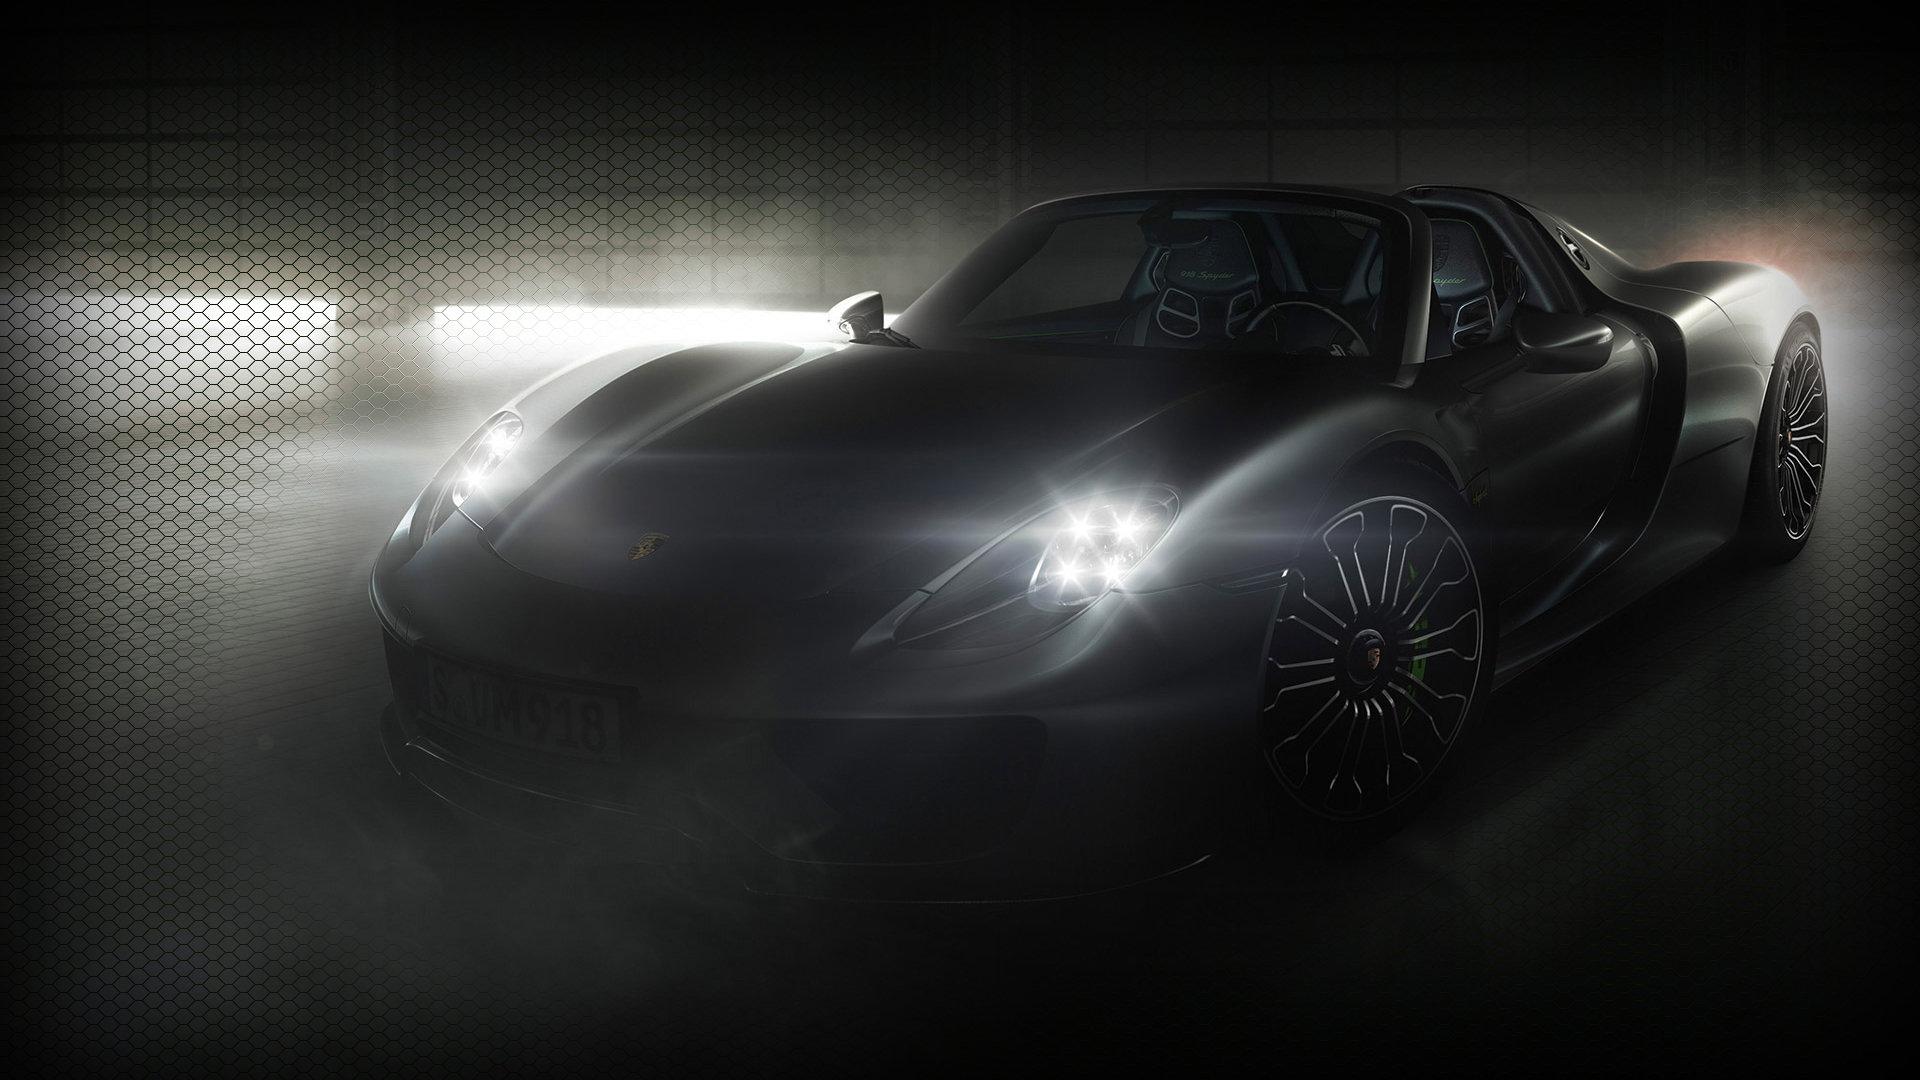 Awesome Porsche 918 Spyder Free Wallpaper ID188574 For Full Hd 1920x1080 Desktop